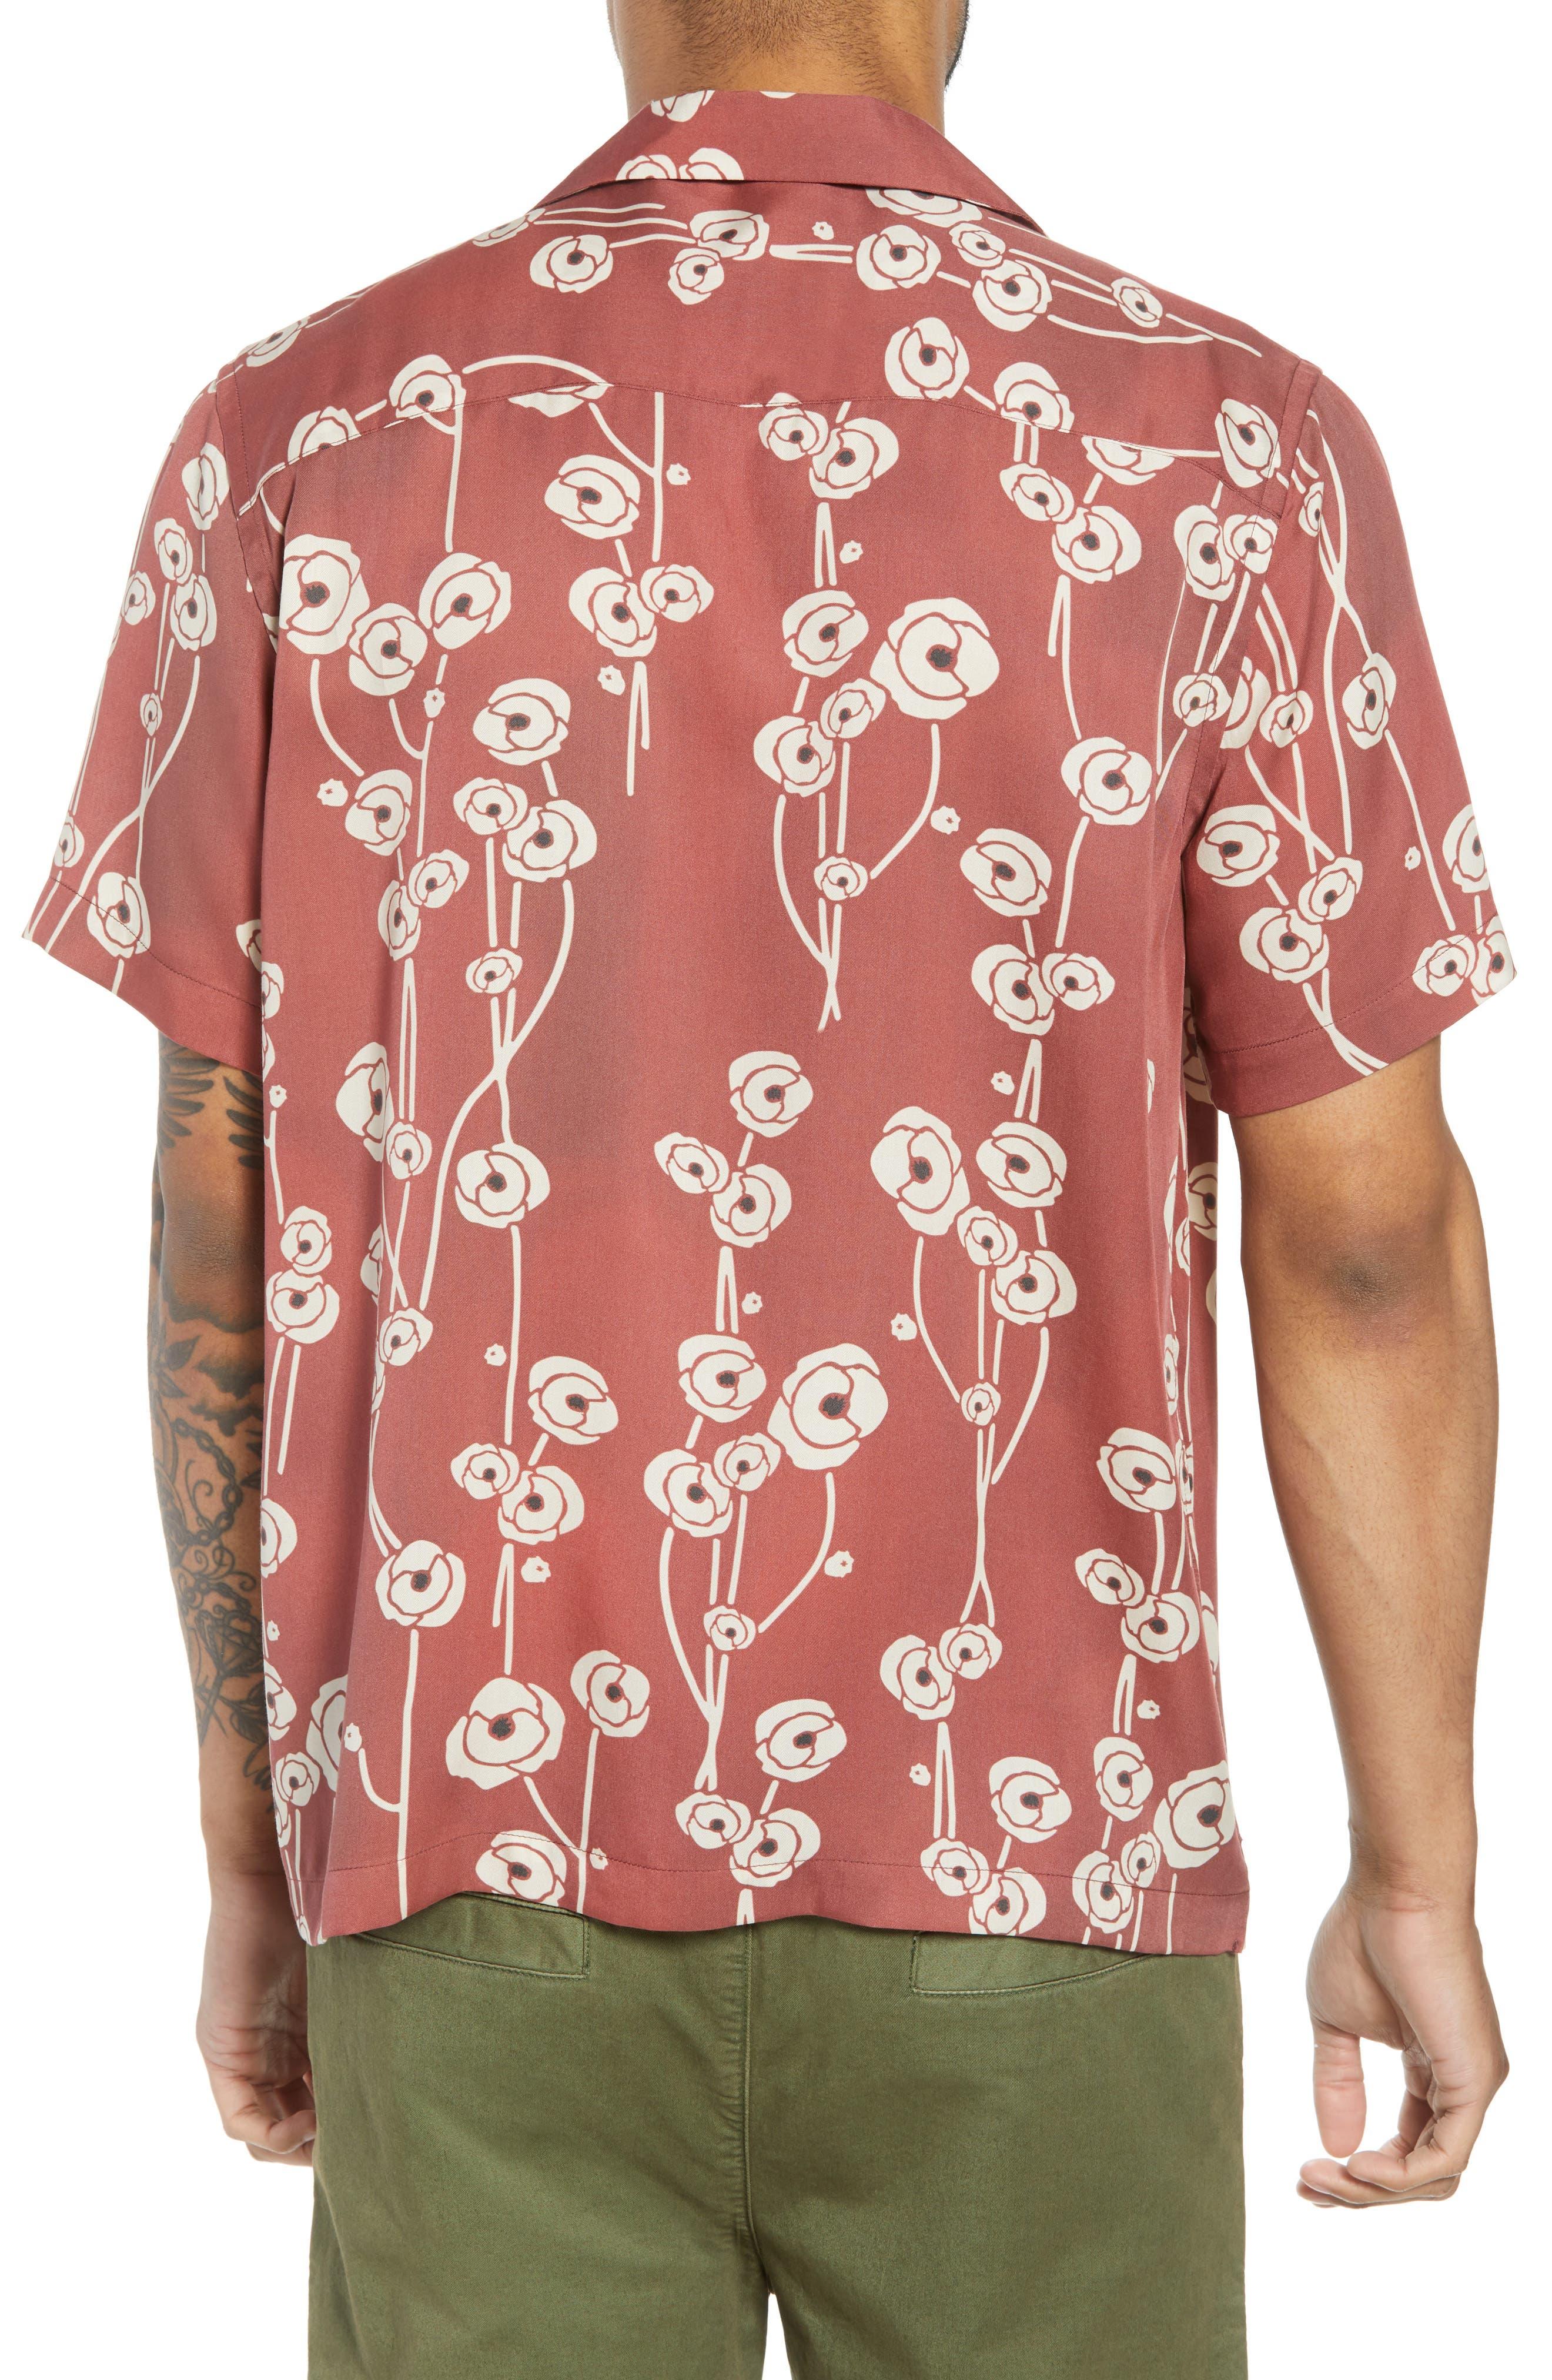 Canty Poppy Woven Shirt,                             Alternate thumbnail 4, color,                             Brick